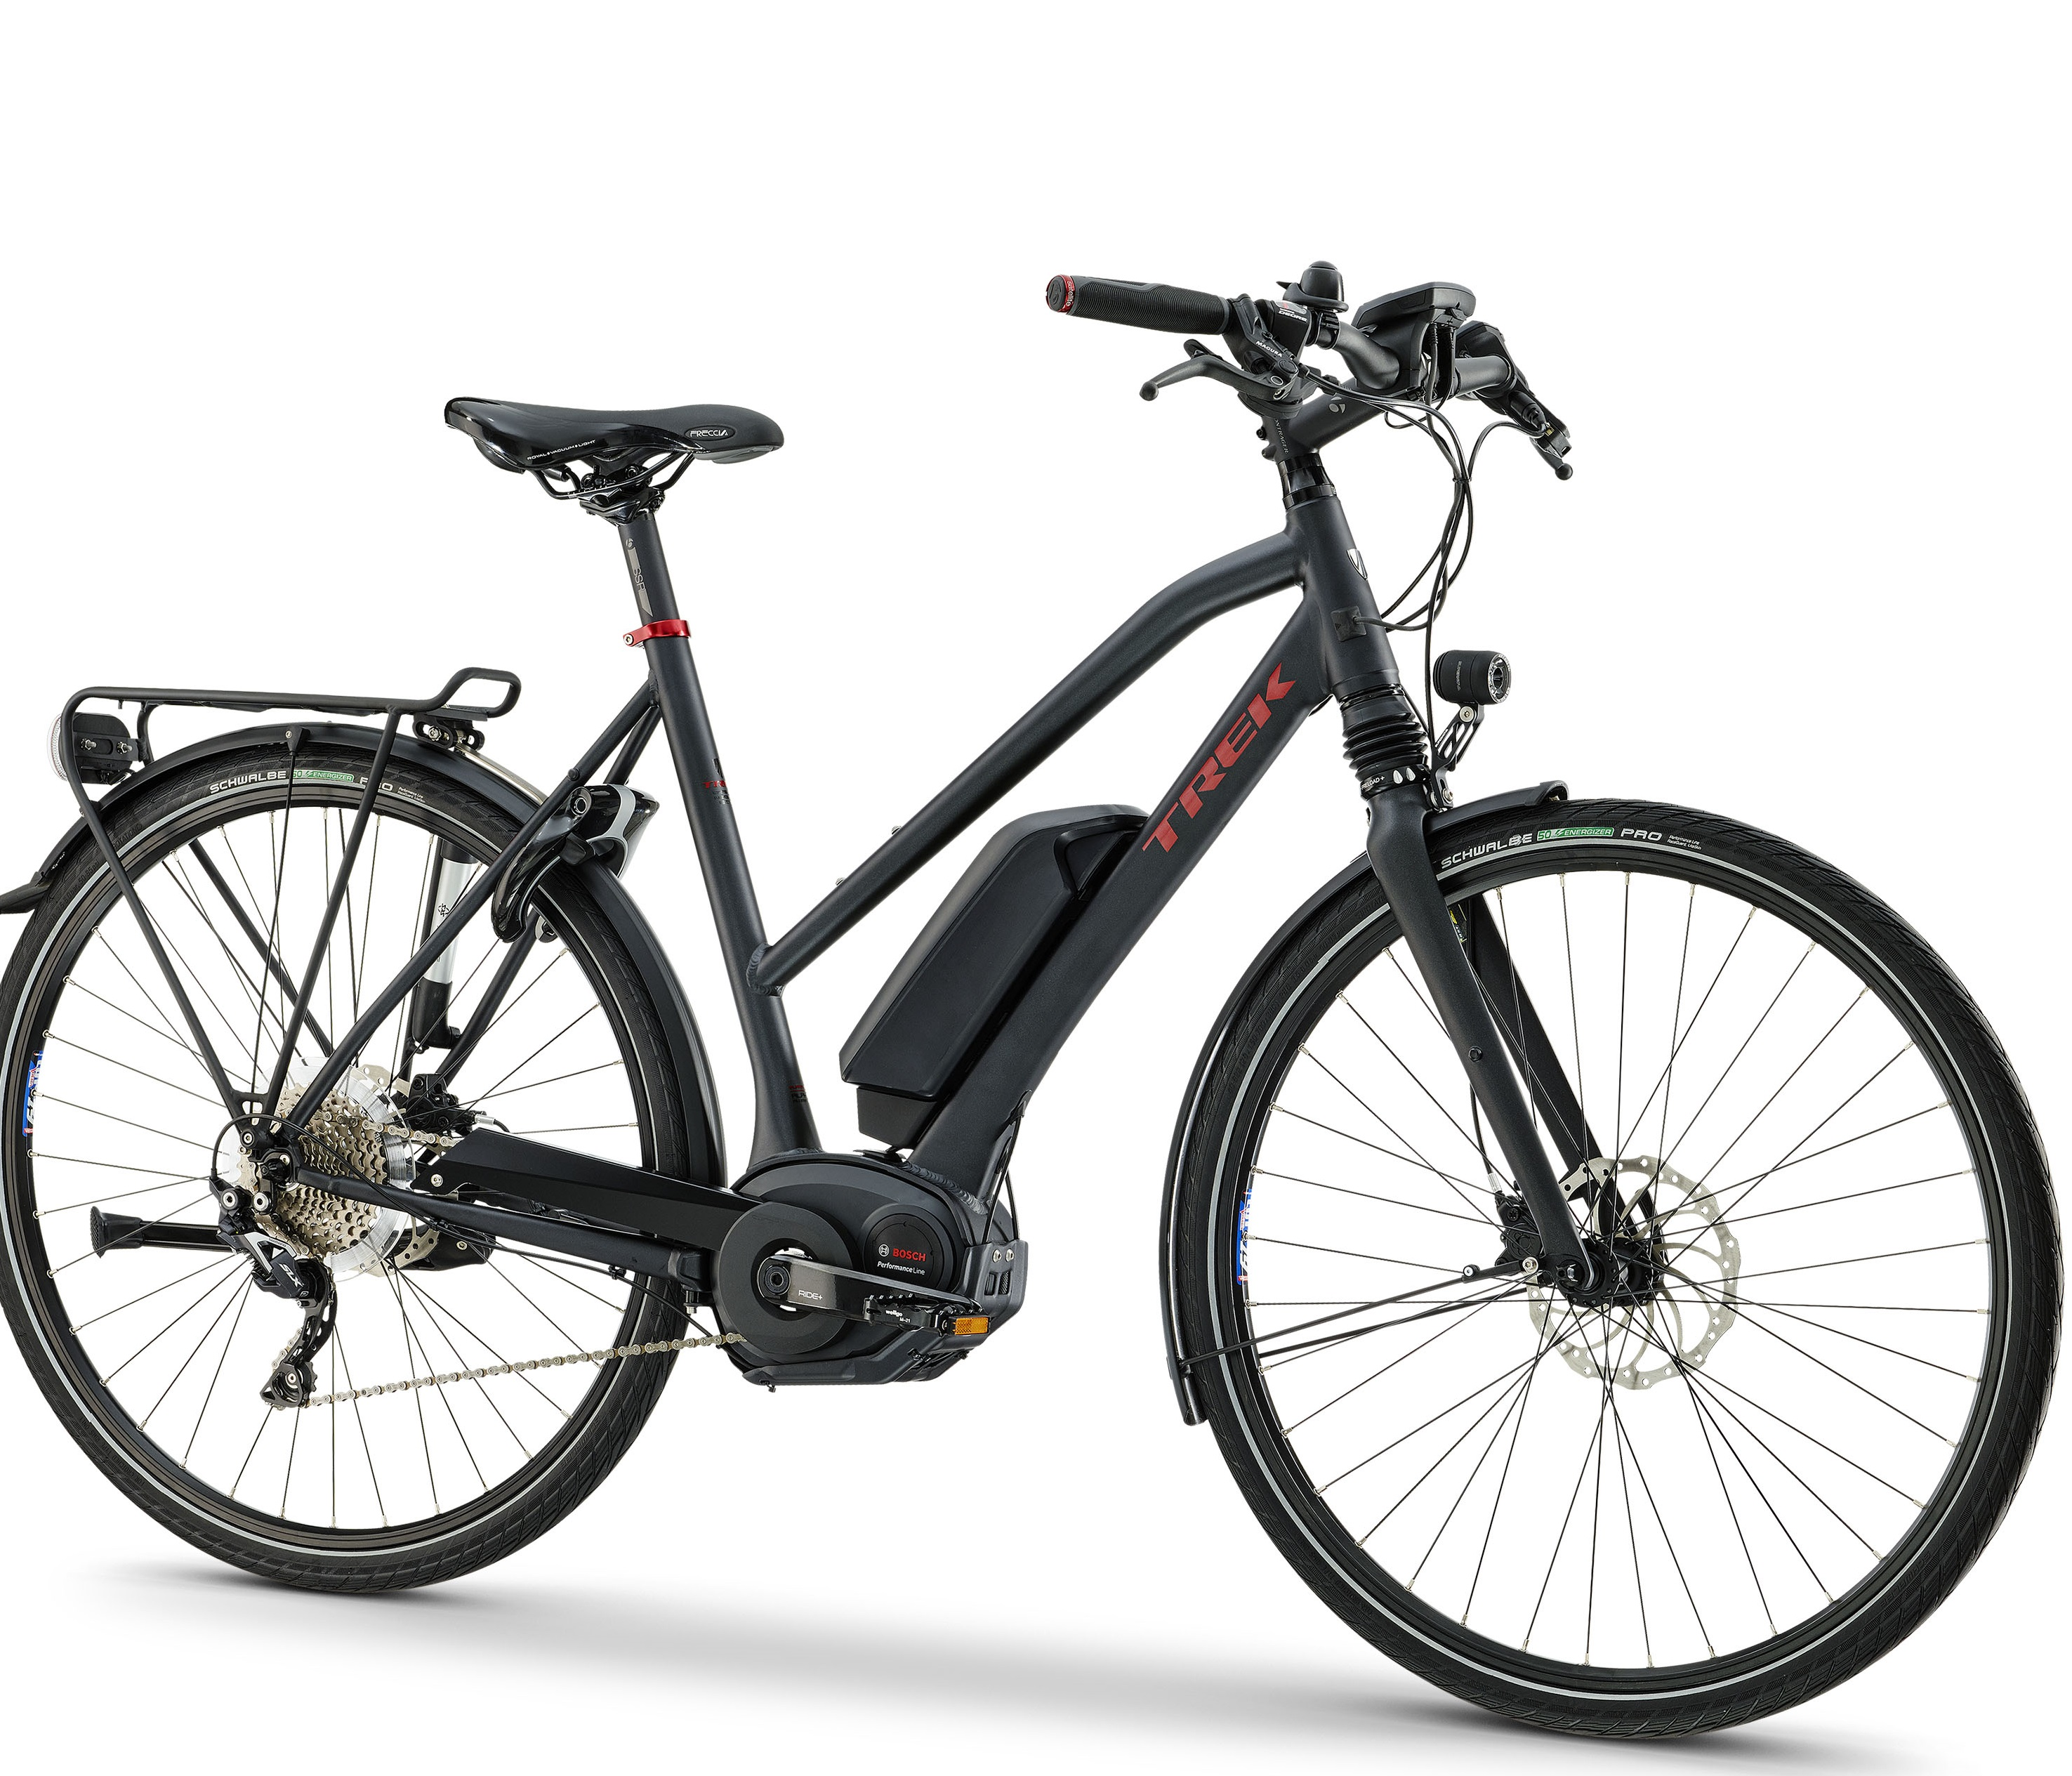 trek presents next generation speed pedelec bike europe. Black Bedroom Furniture Sets. Home Design Ideas